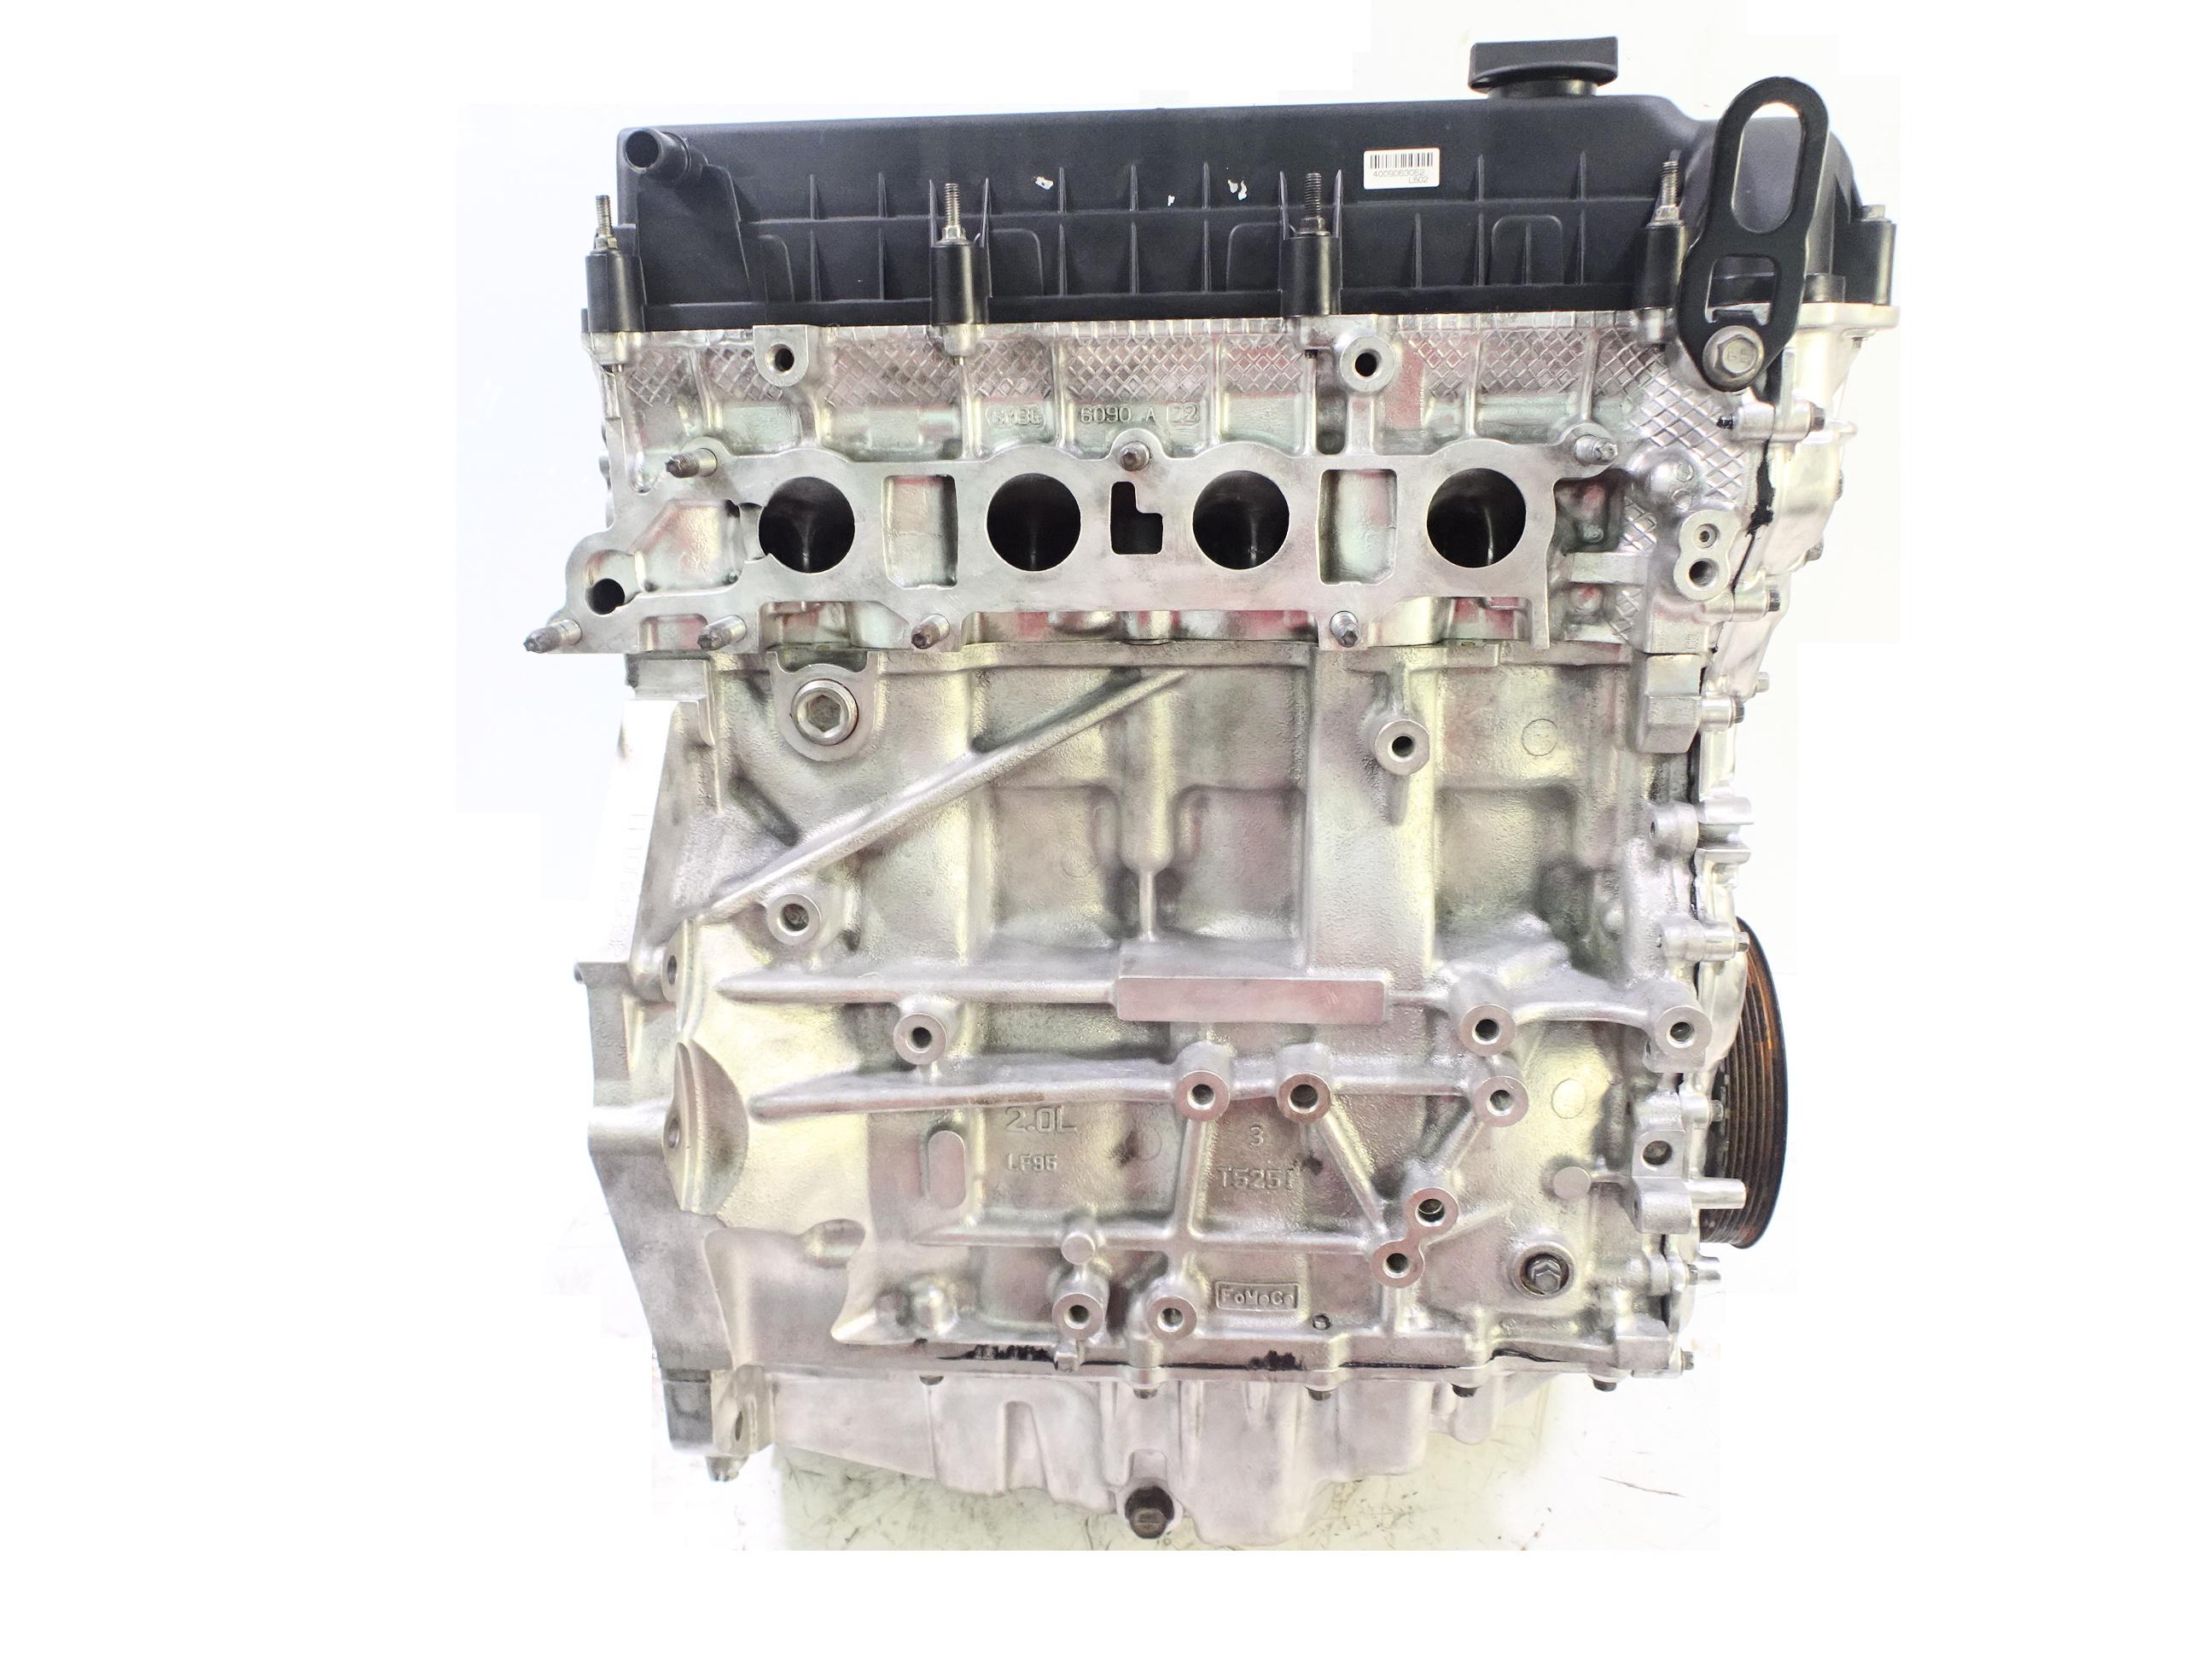 Motor 2007 Mazda 6 GG GY 2,0 LF LFF7 147 PS Kolben Dichtung NEU Kopf geplant